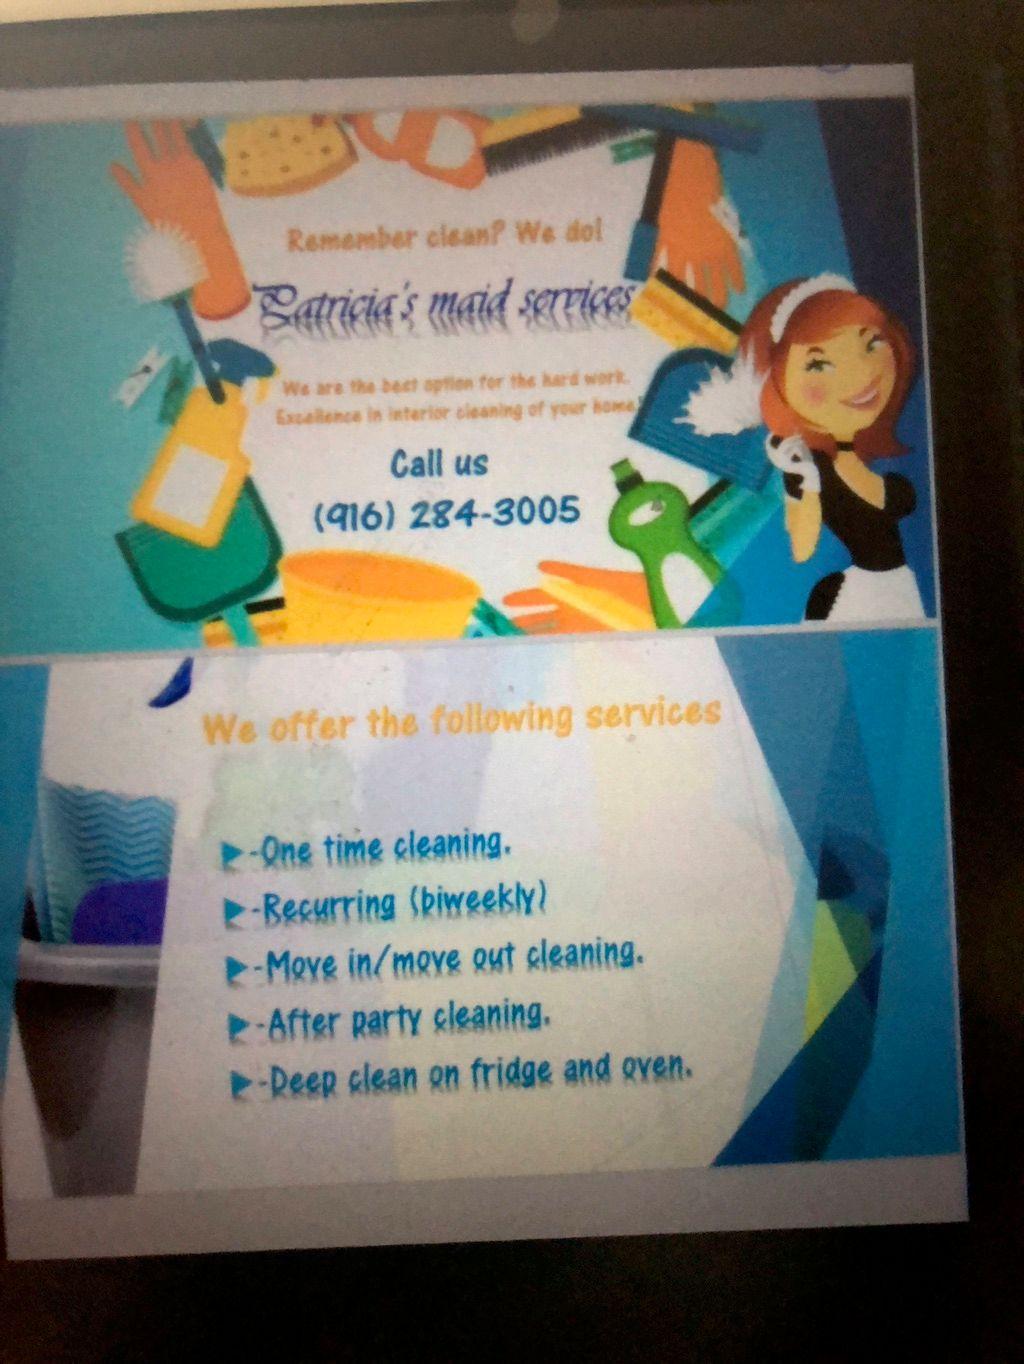 Patricia's maid services